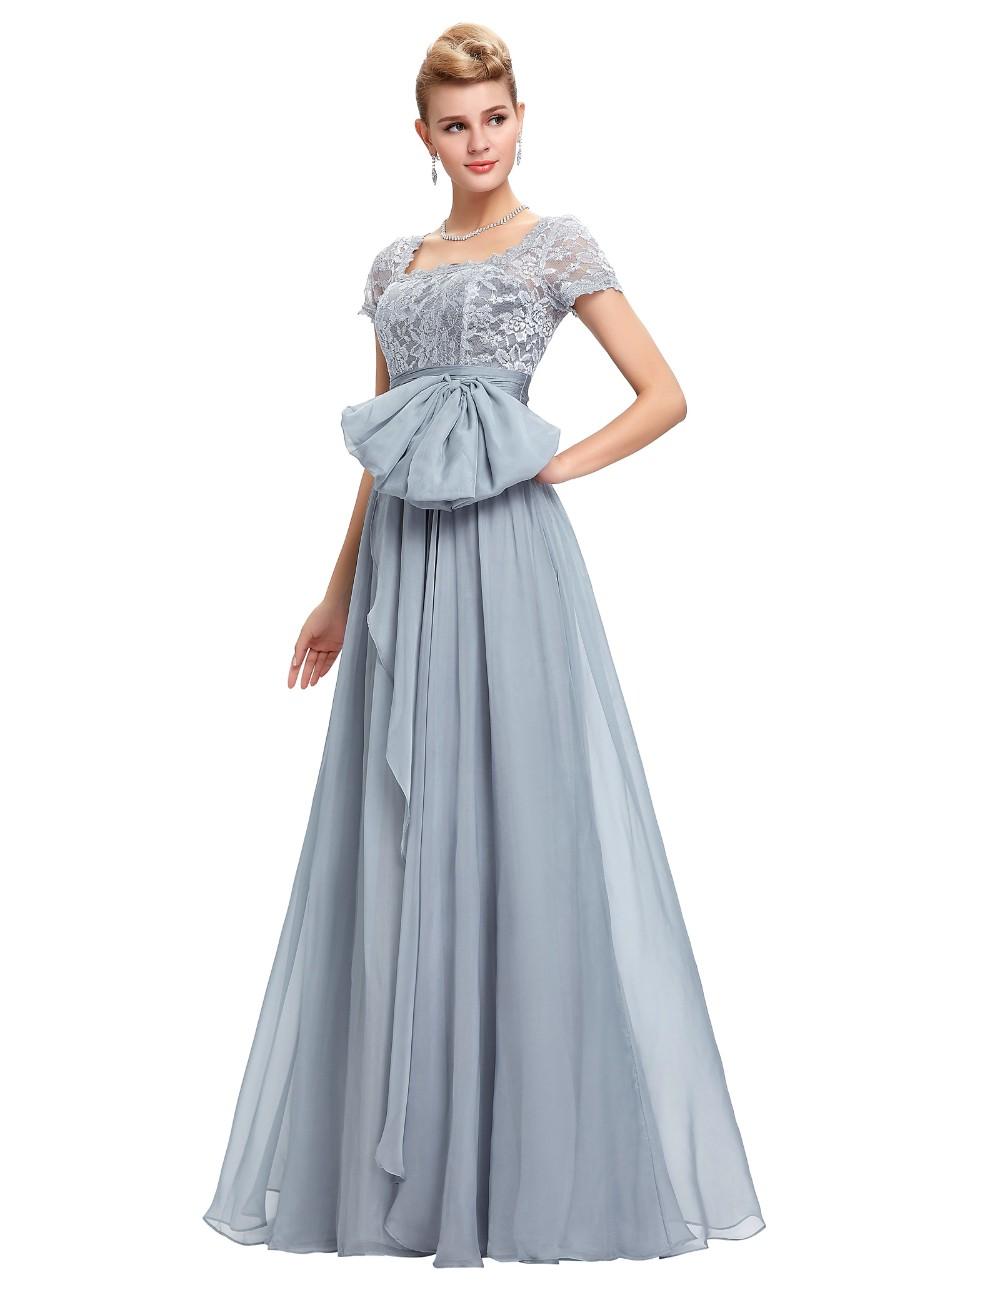 Grace Karin Chiffon Lace Elegant Long Evening Dresses Grey Formal Evening Gowns robe de soiree longue GK4445 9